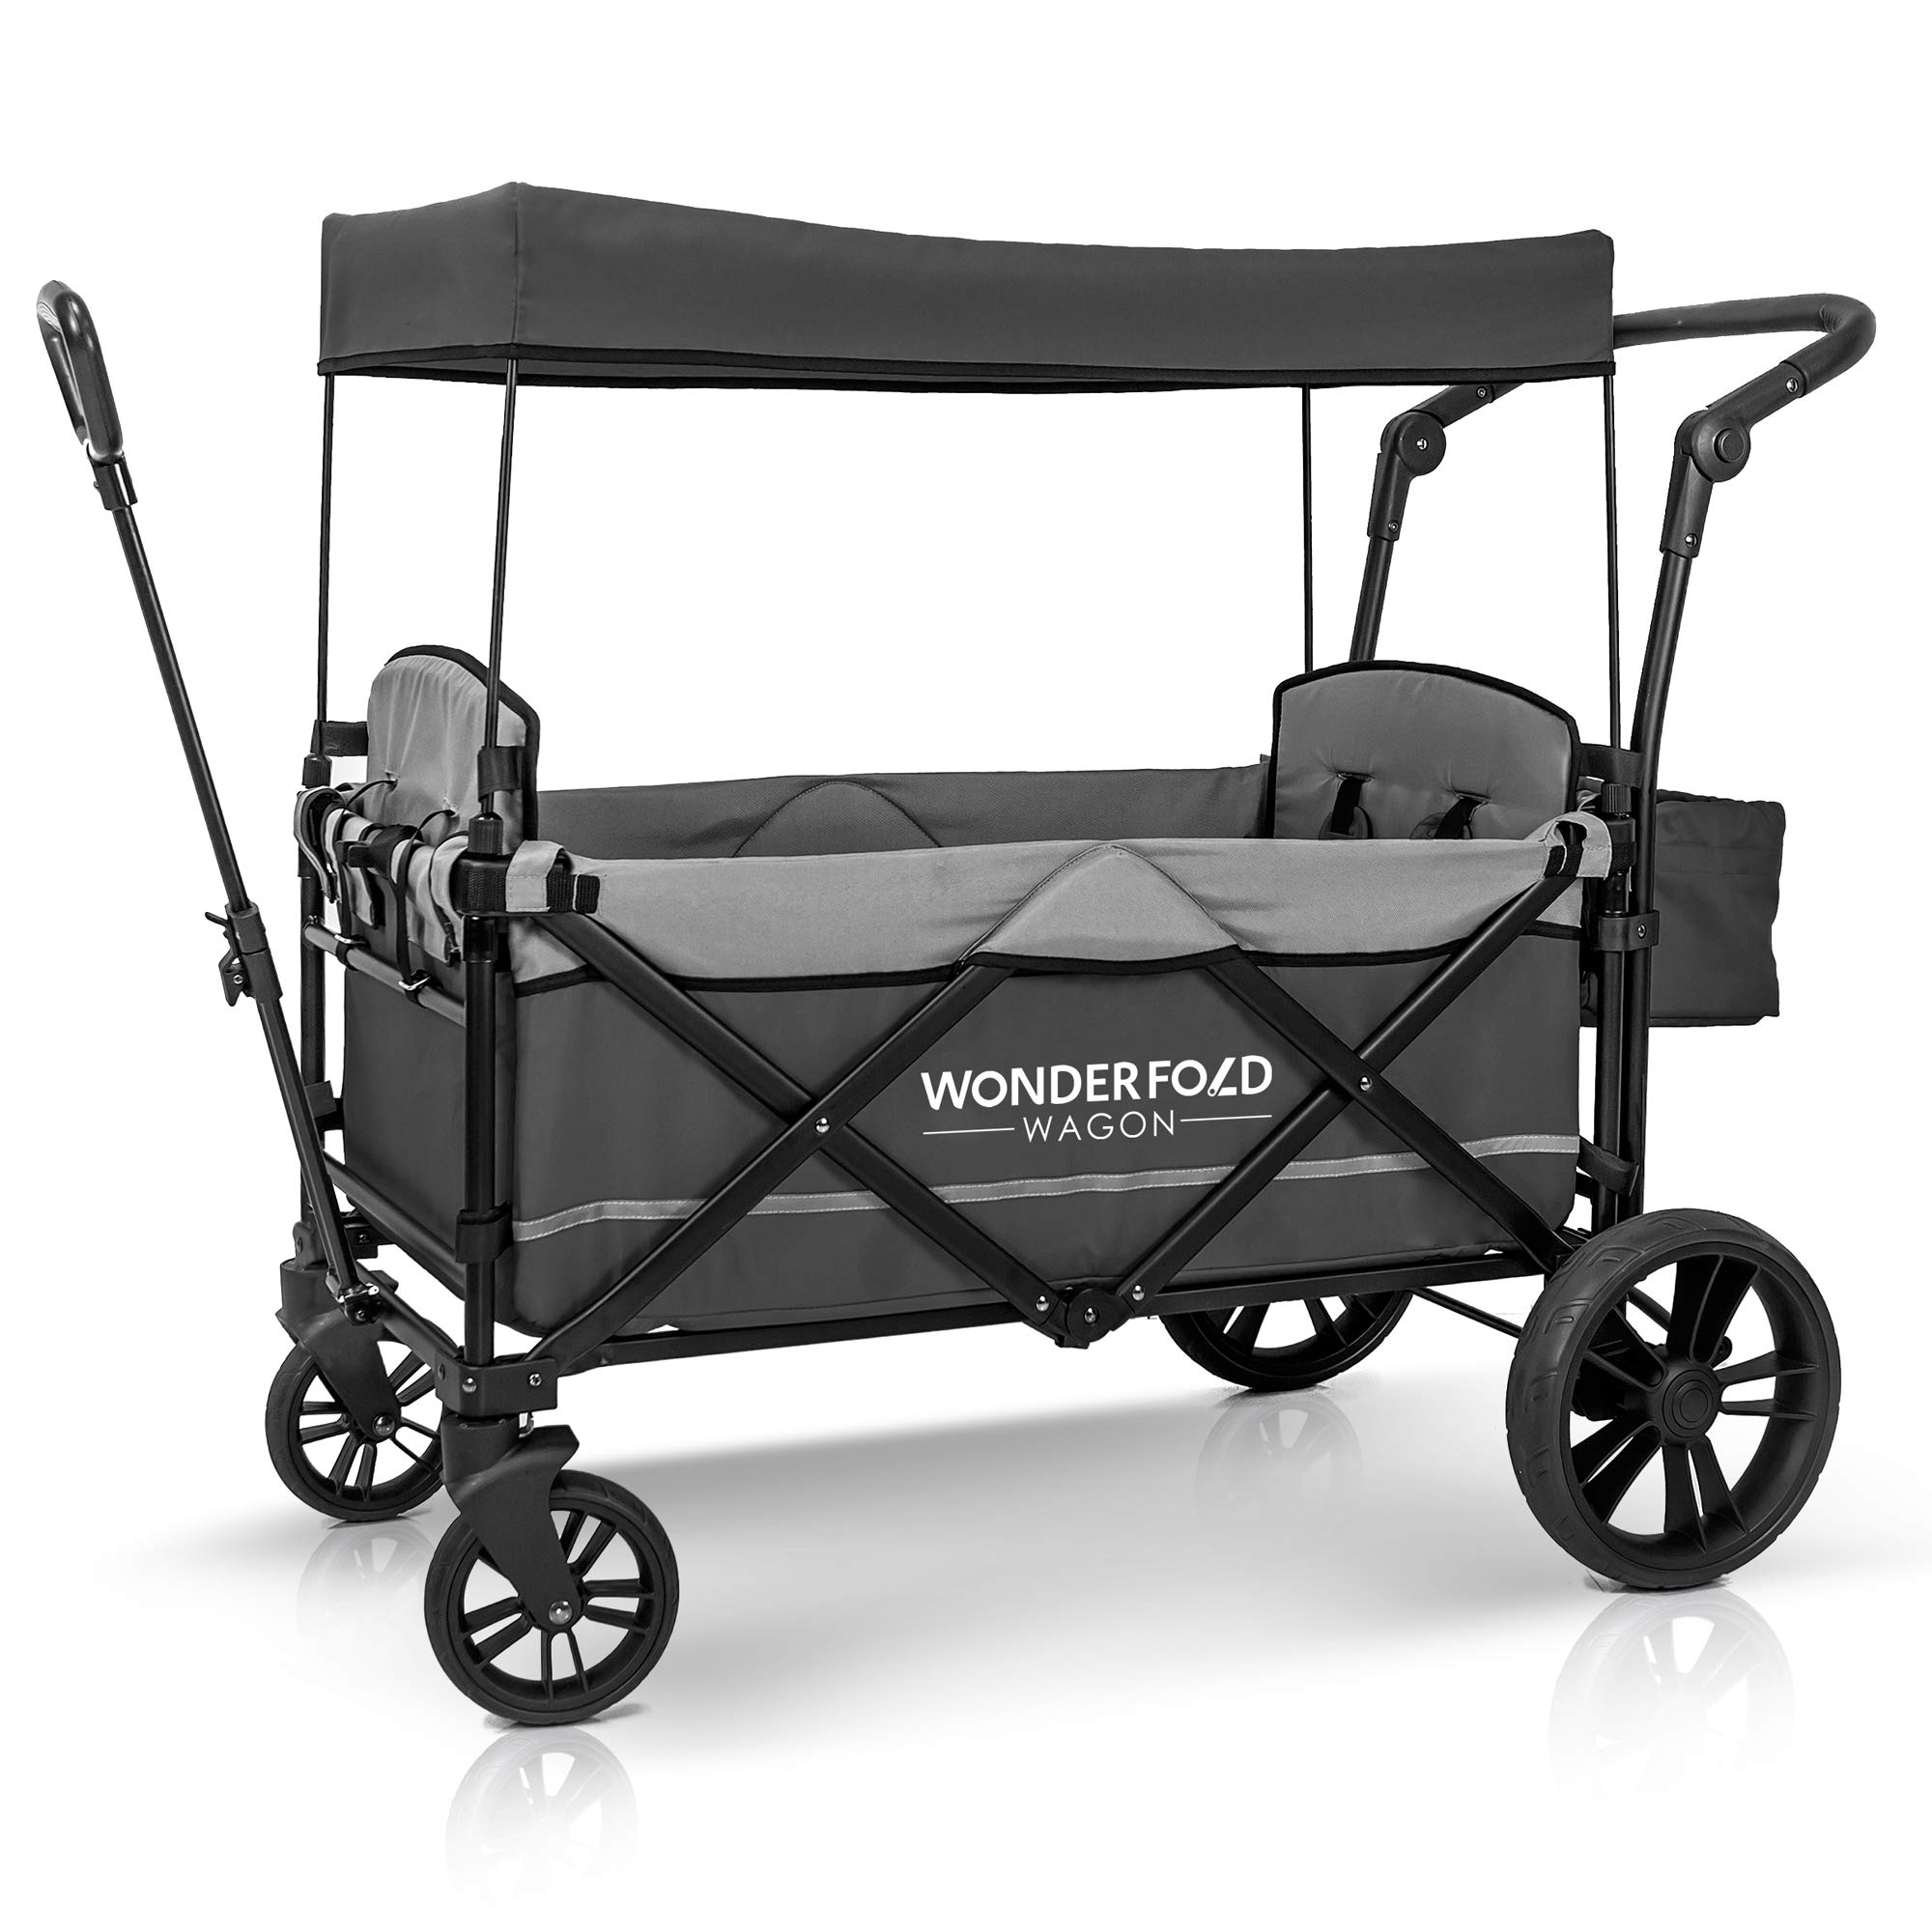 WonderFold Baby 2-Passenger Stroller Wagon, Gray by WonderFold Baby